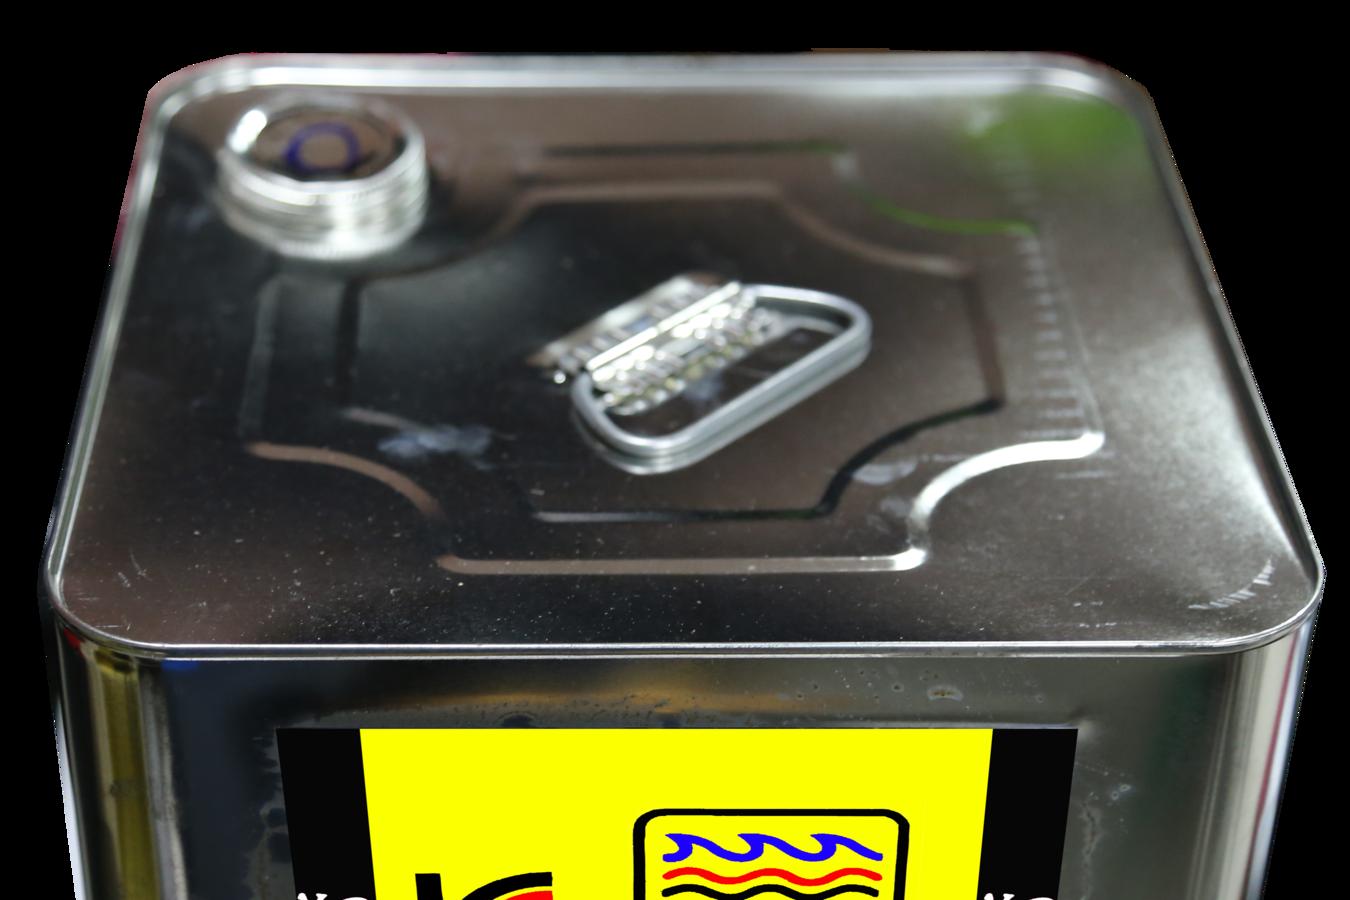 Original product304 image5